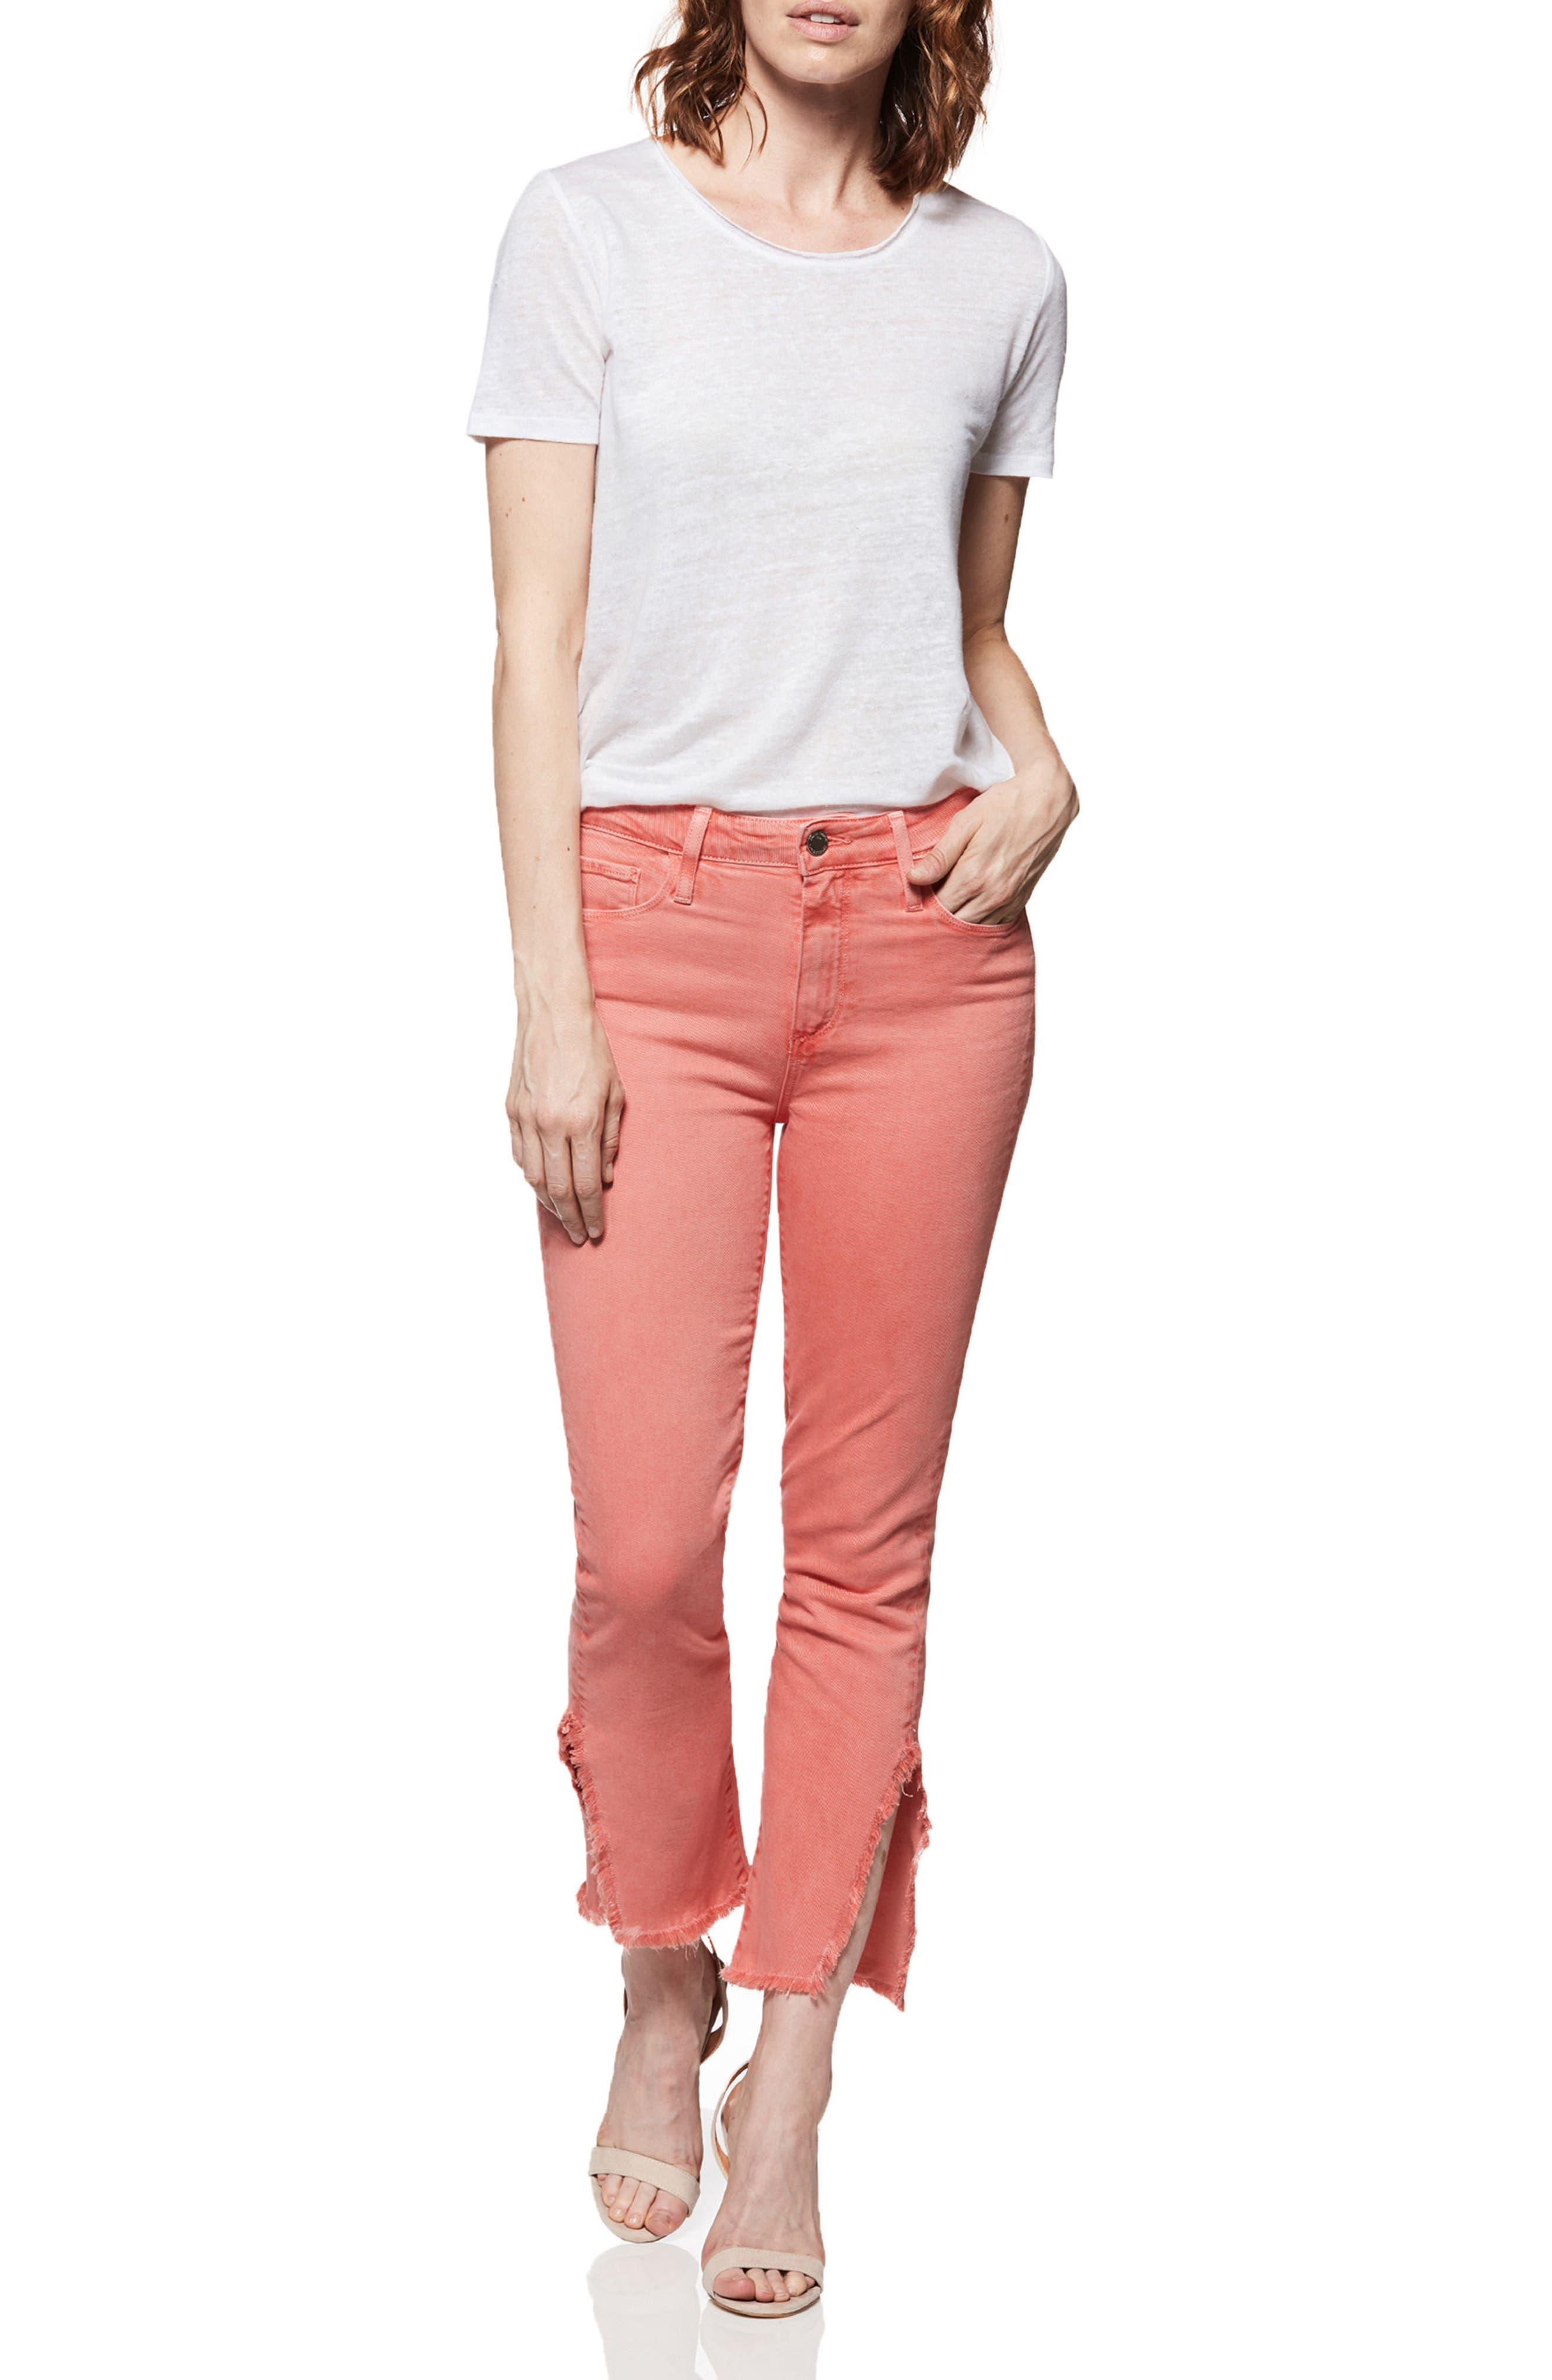 Hoxton High Waist Slit Hem Ankle Straight Jeans,                             Alternate thumbnail 3, color,                             Vintage Coral Reef